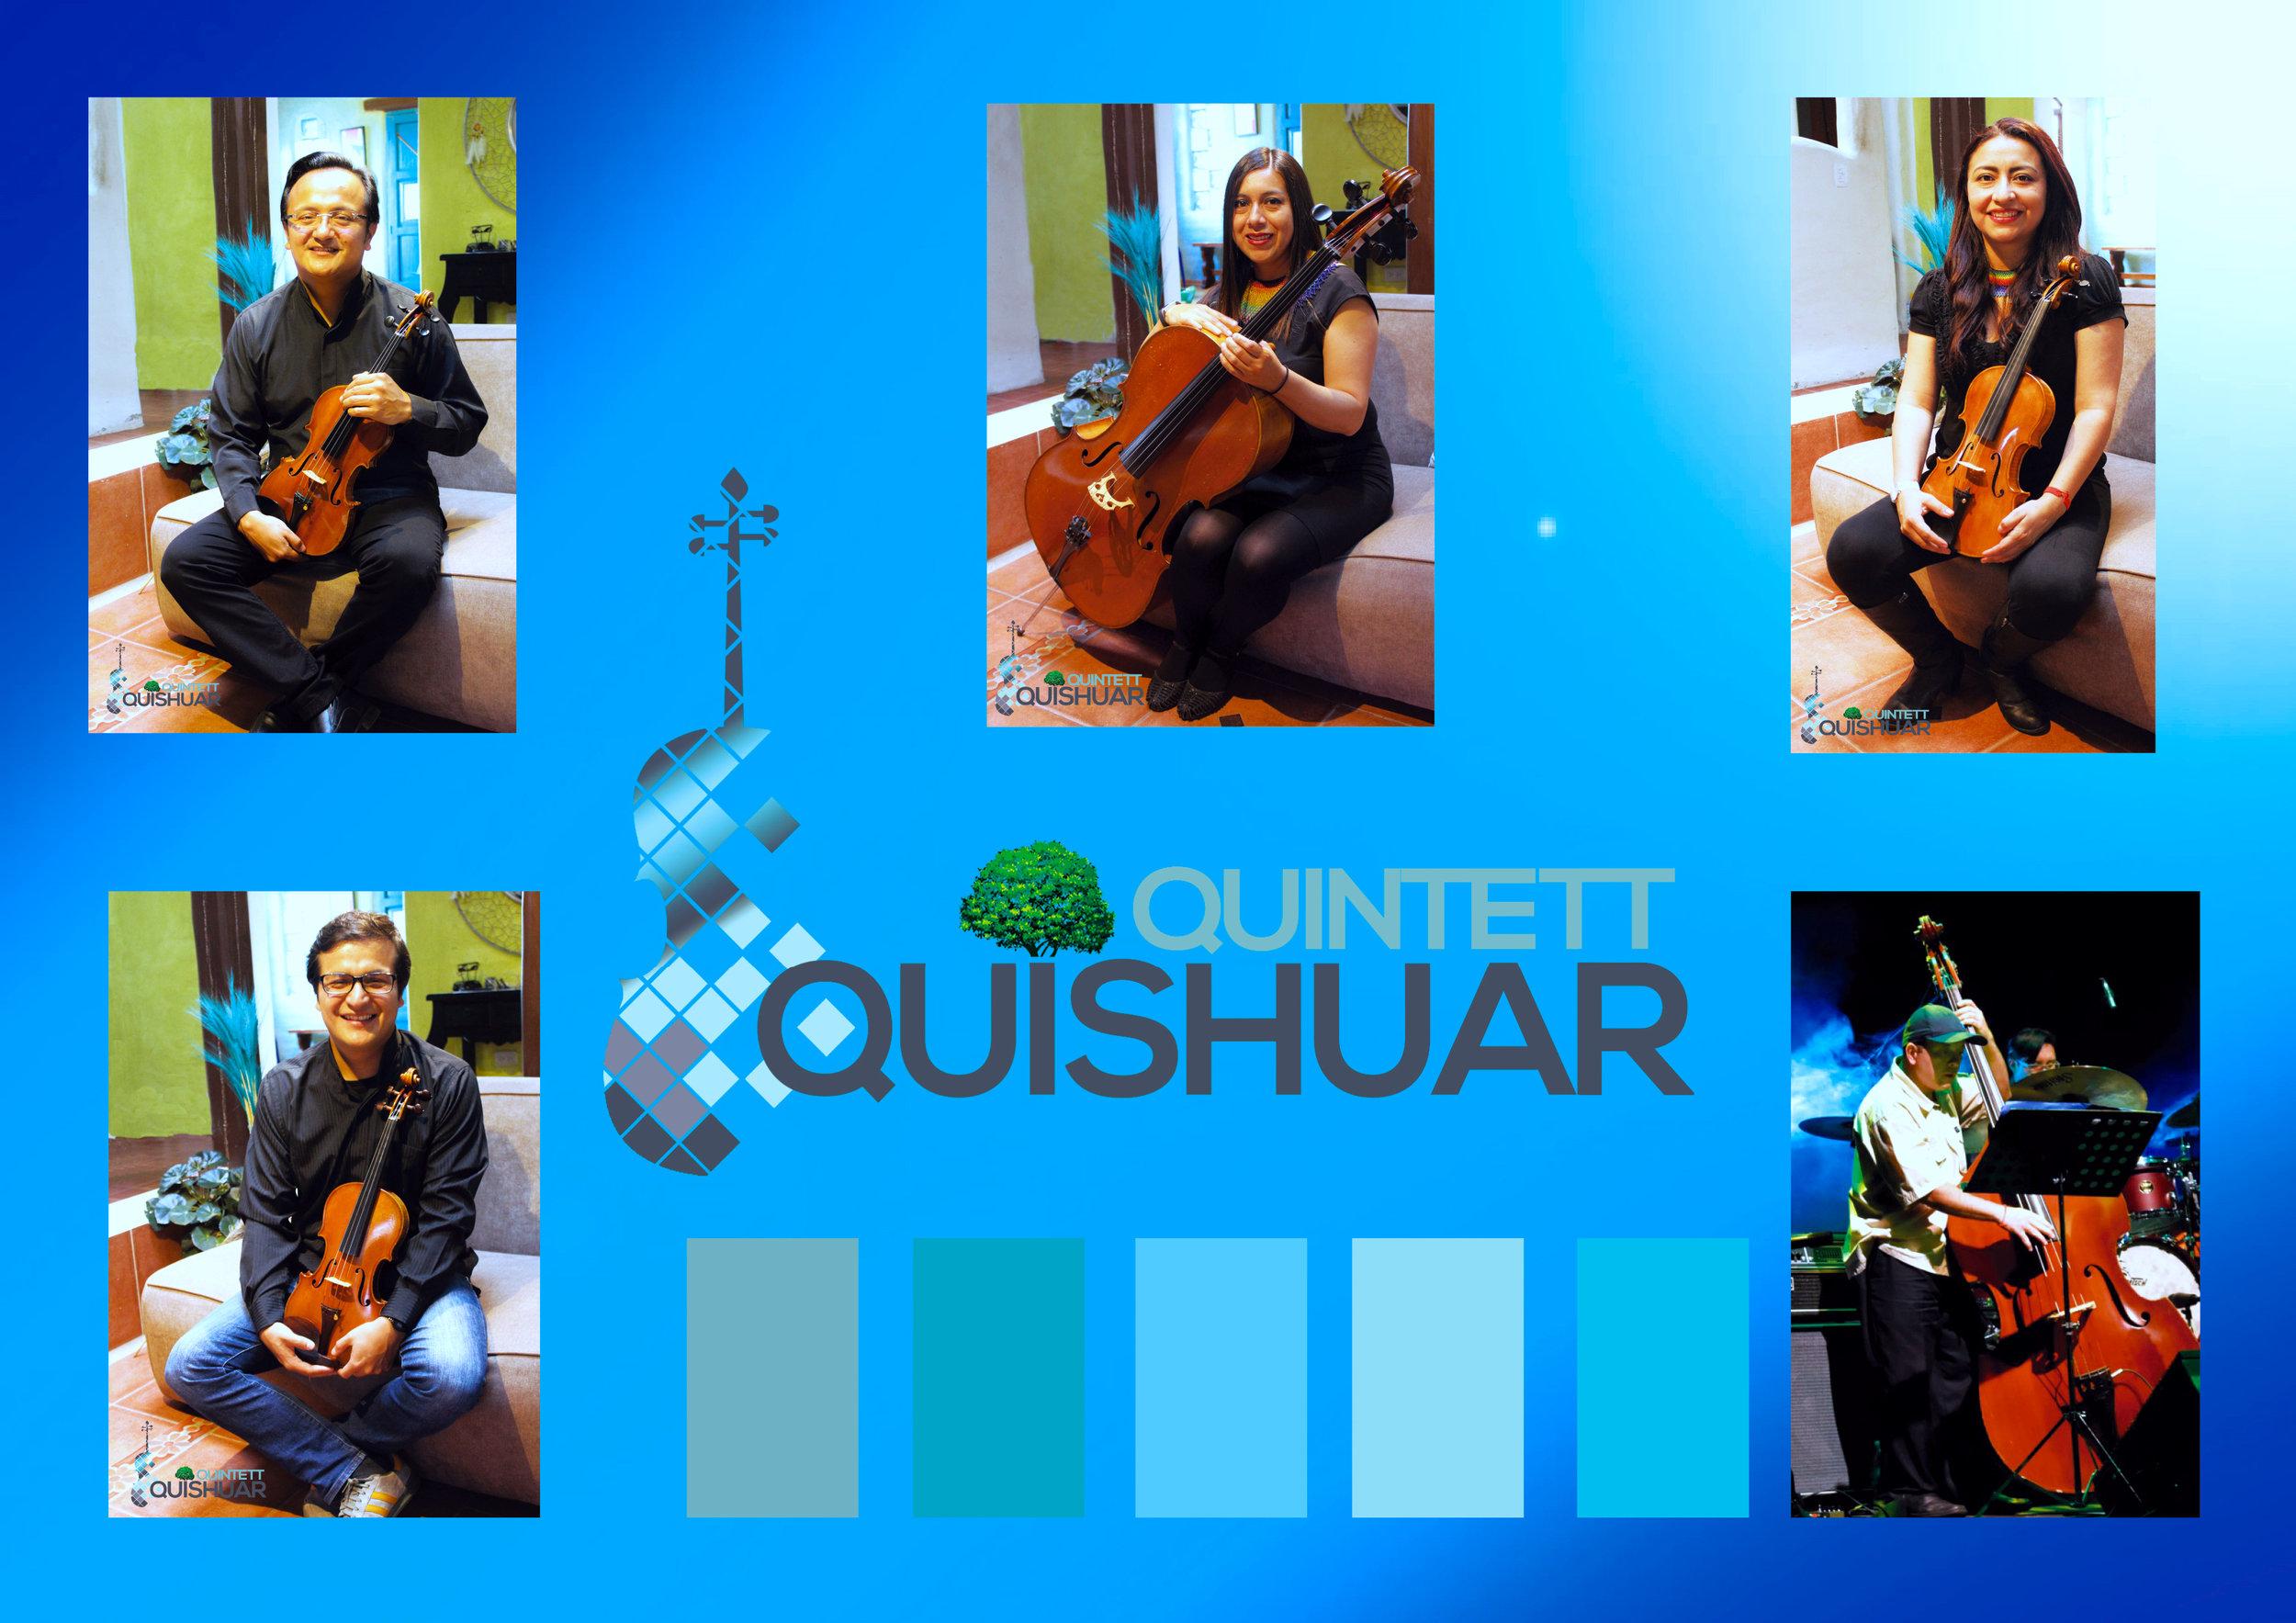 QuishuarQuintett.jpg